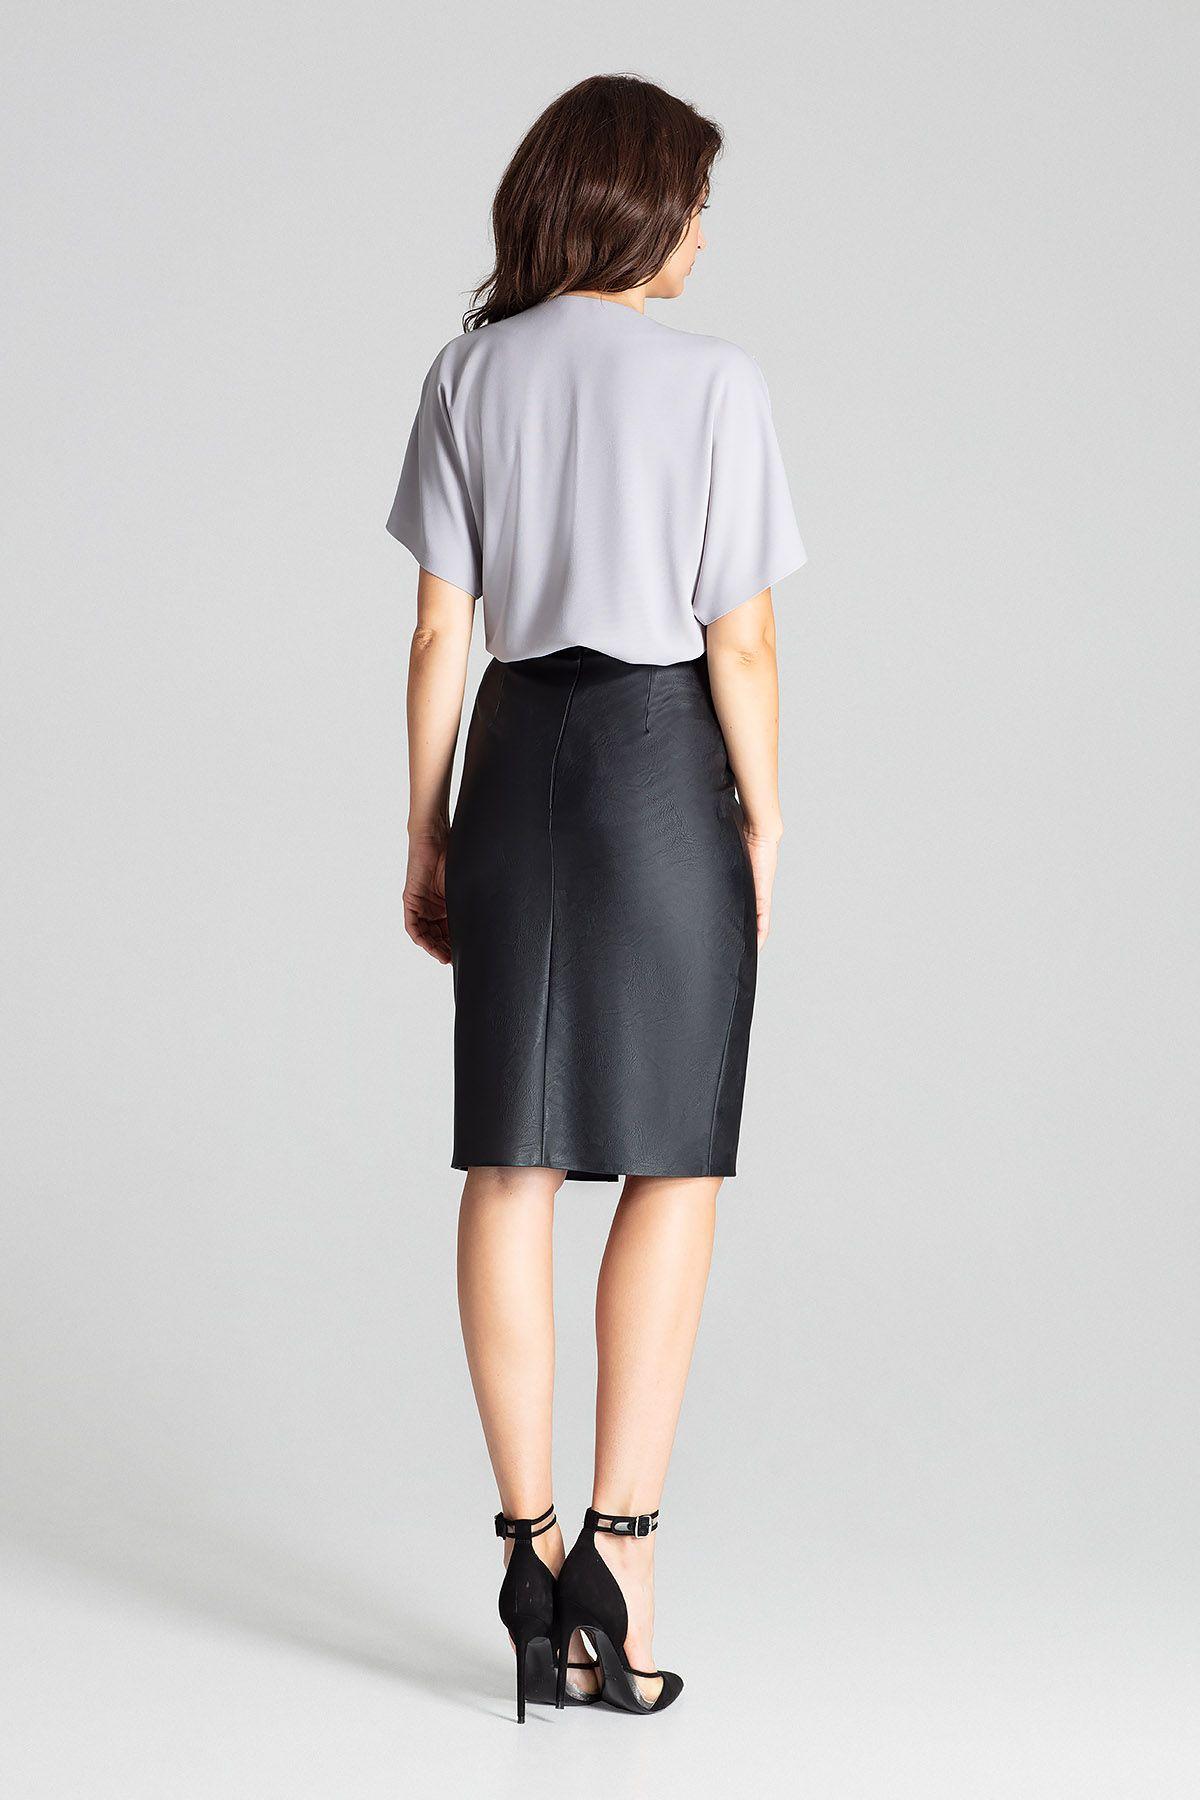 Black Eco-leather Pencil Midi Skirt